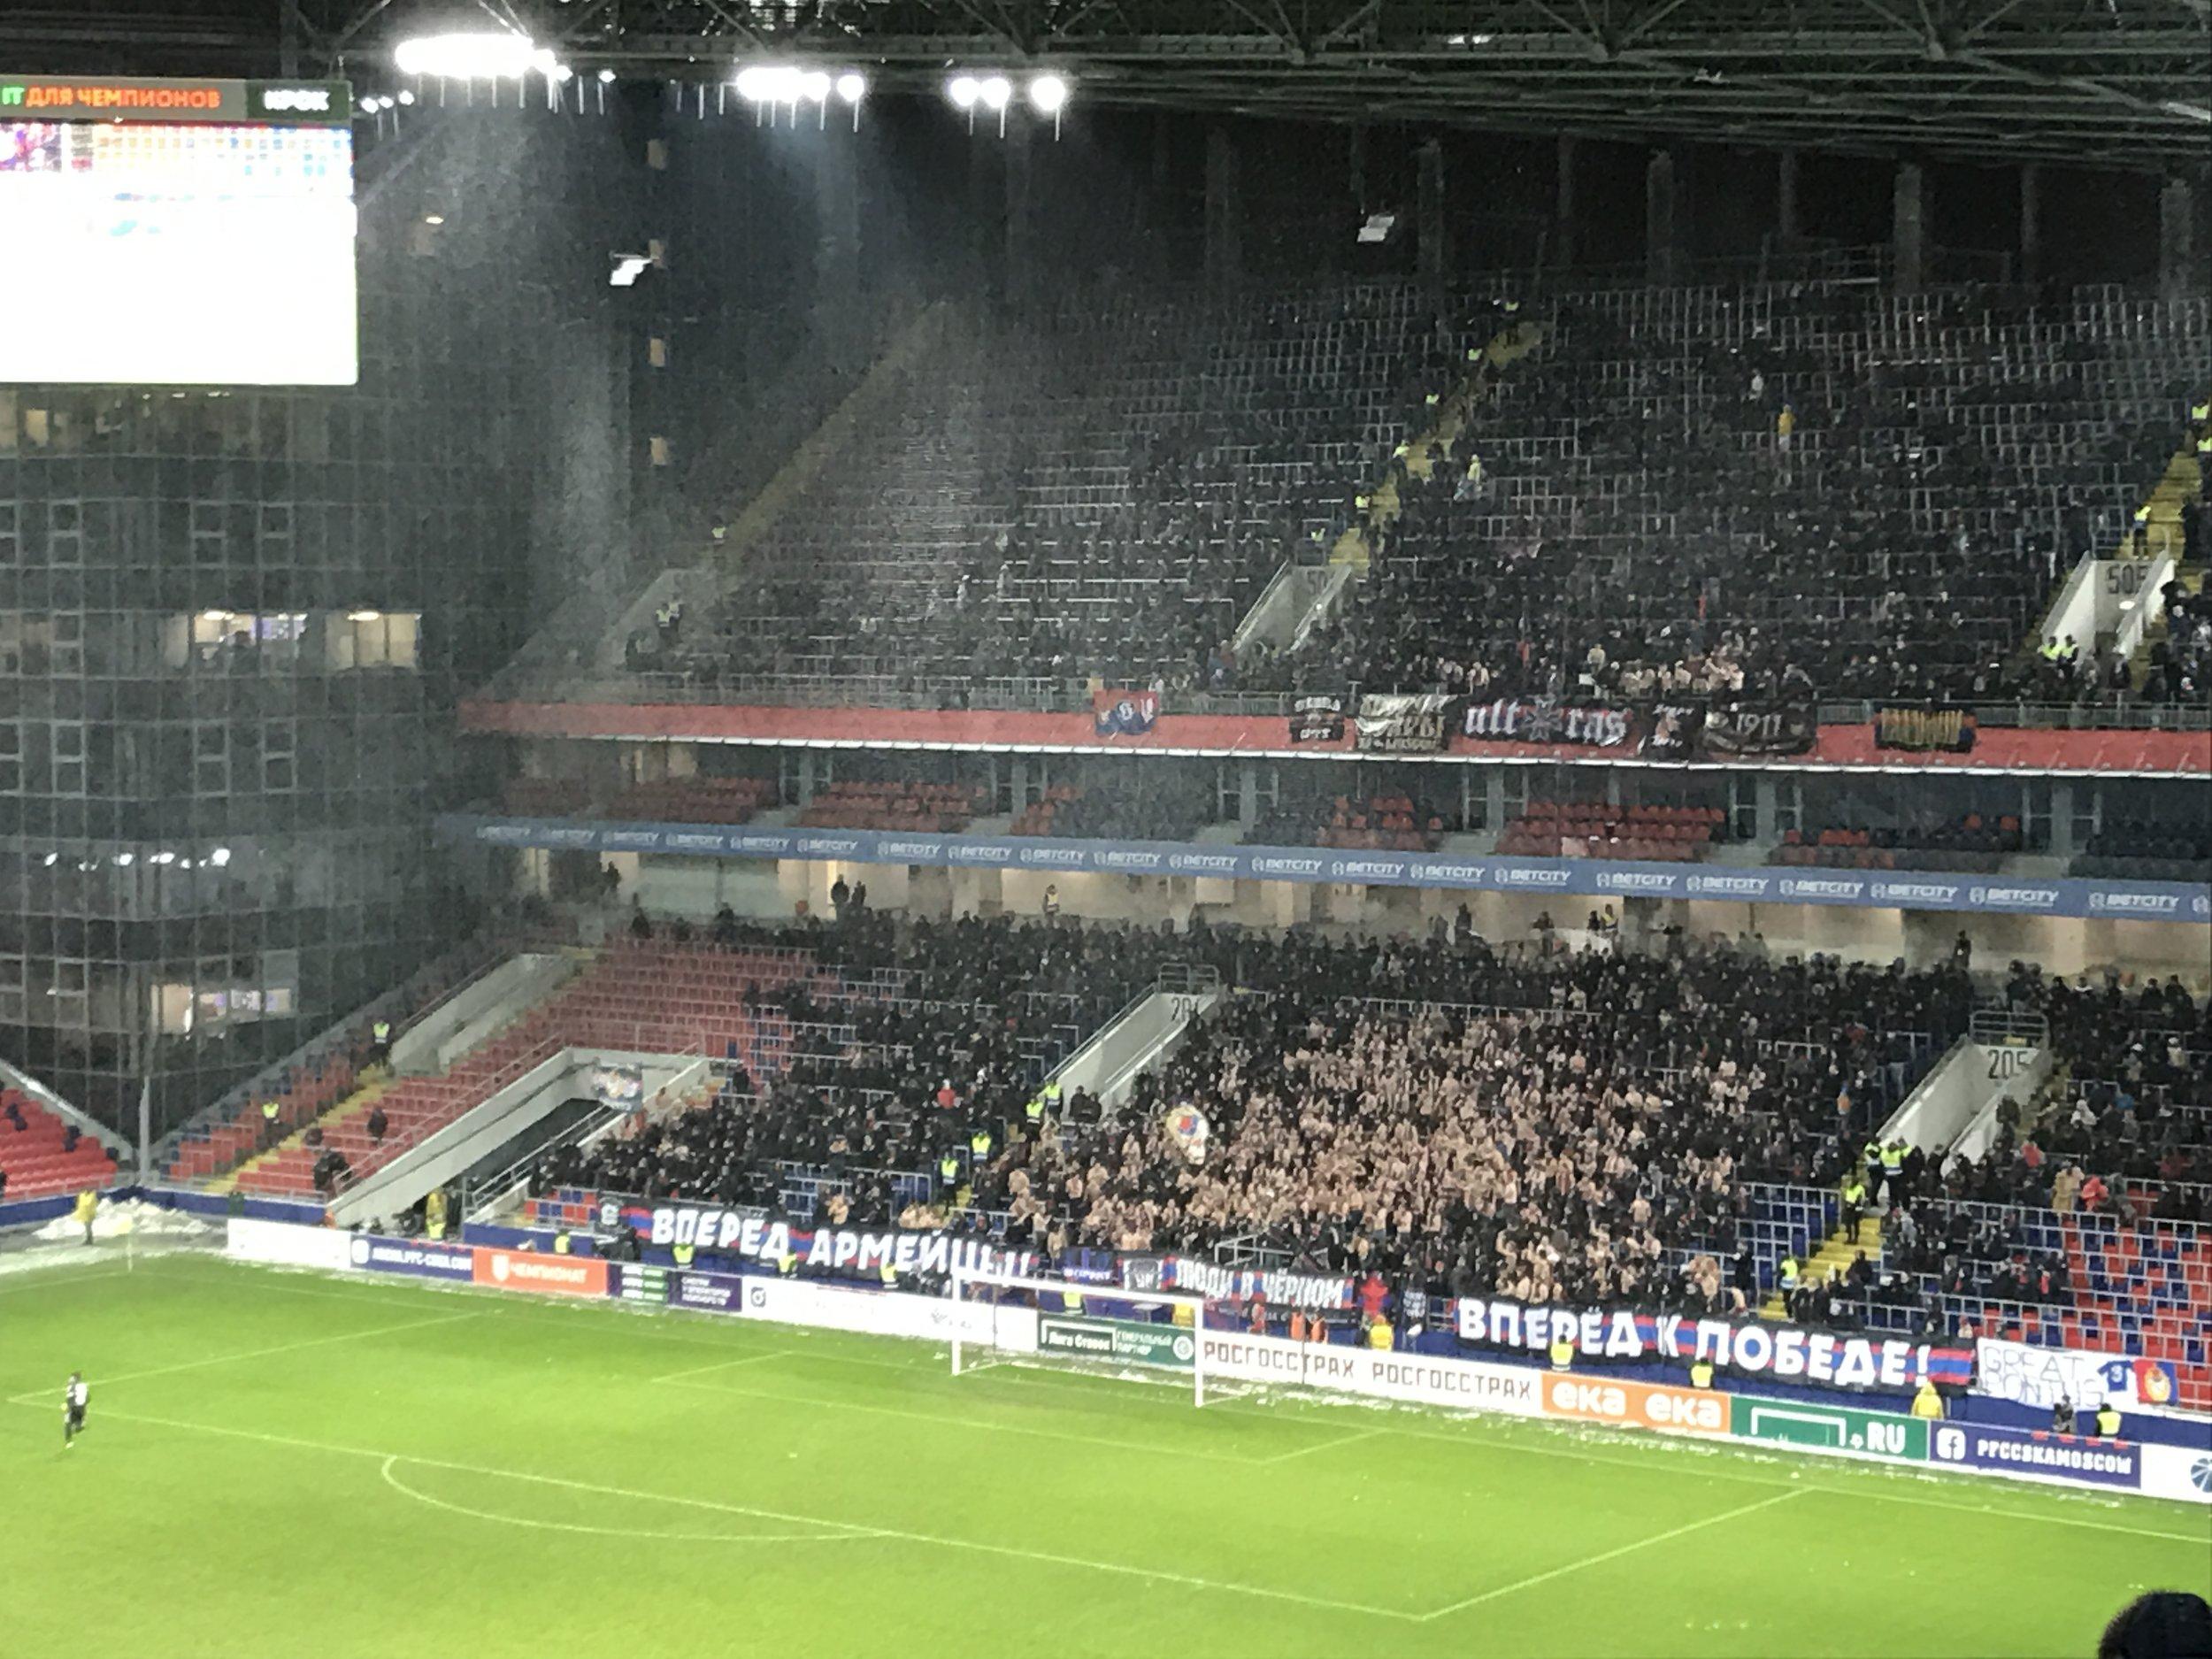 CSKA-Moscow-Ultras-Stand